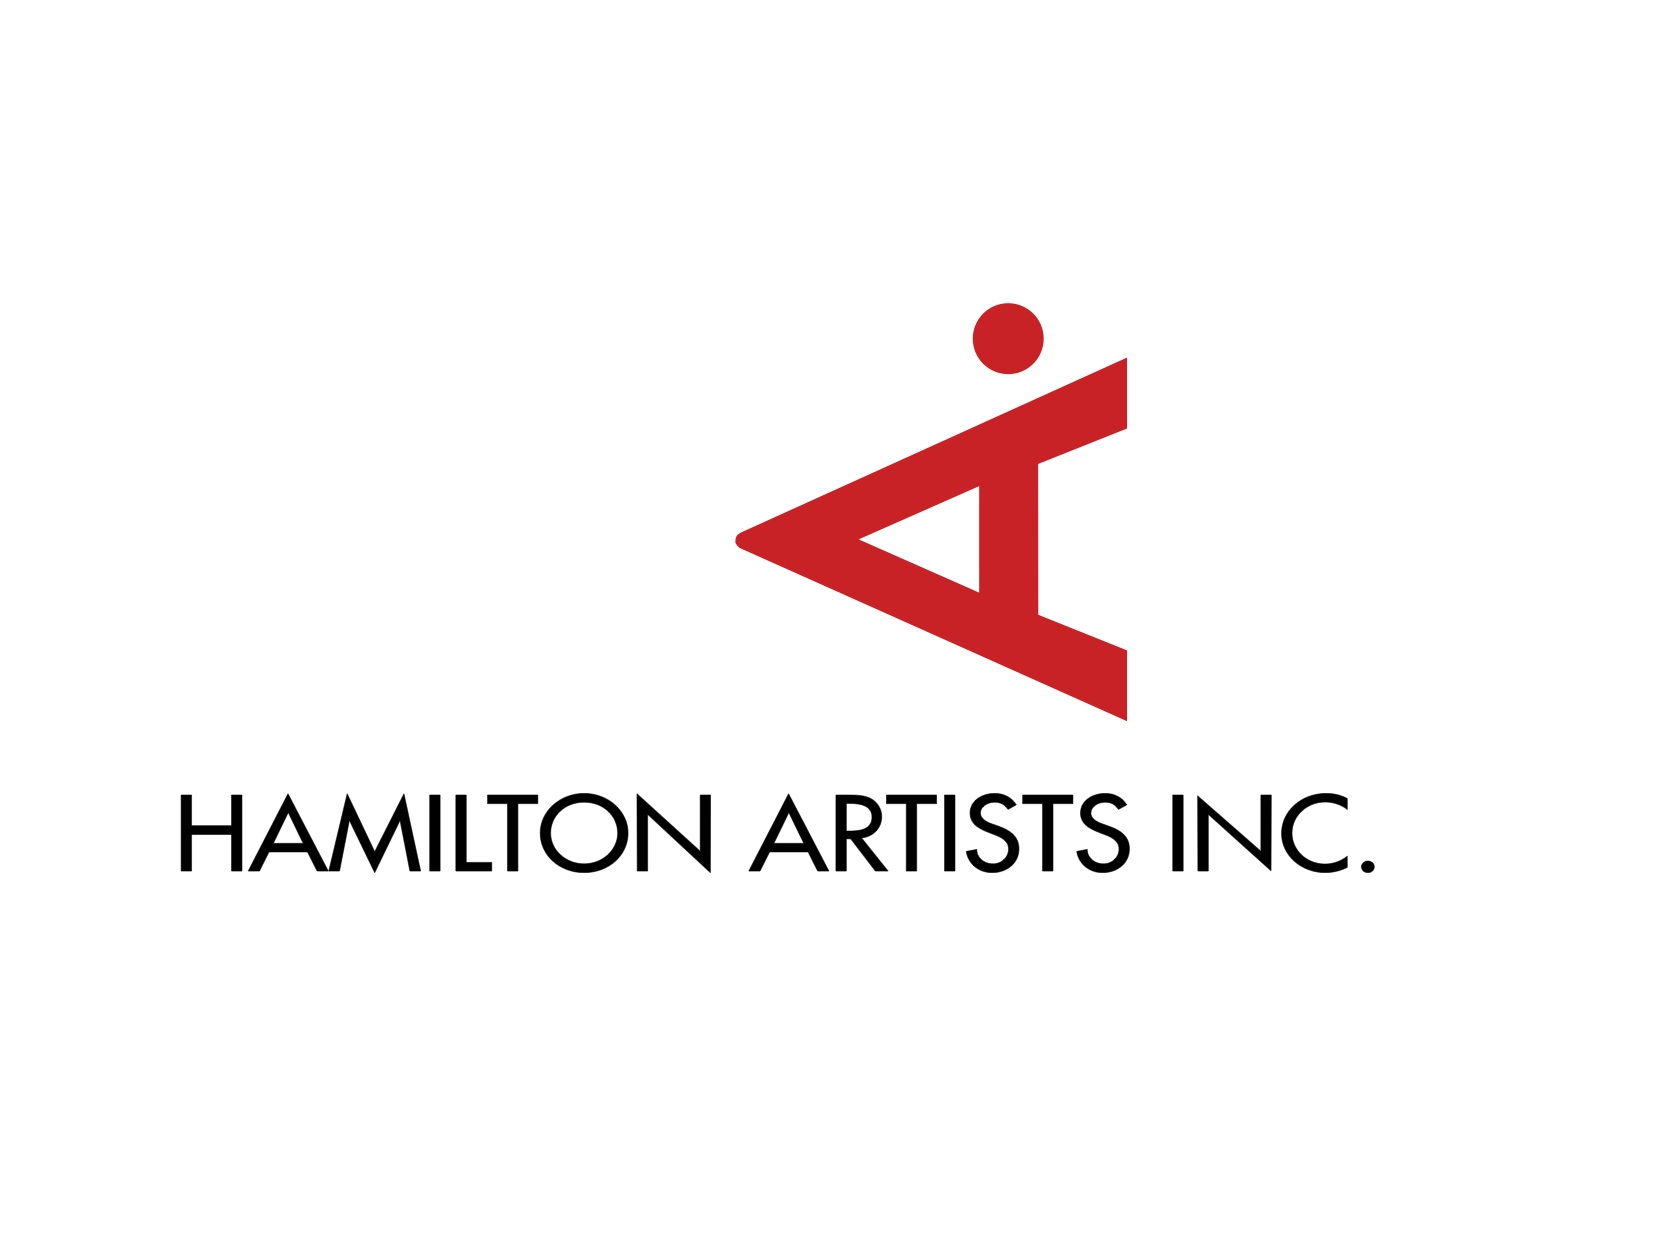 Hamilton Artists Inc.